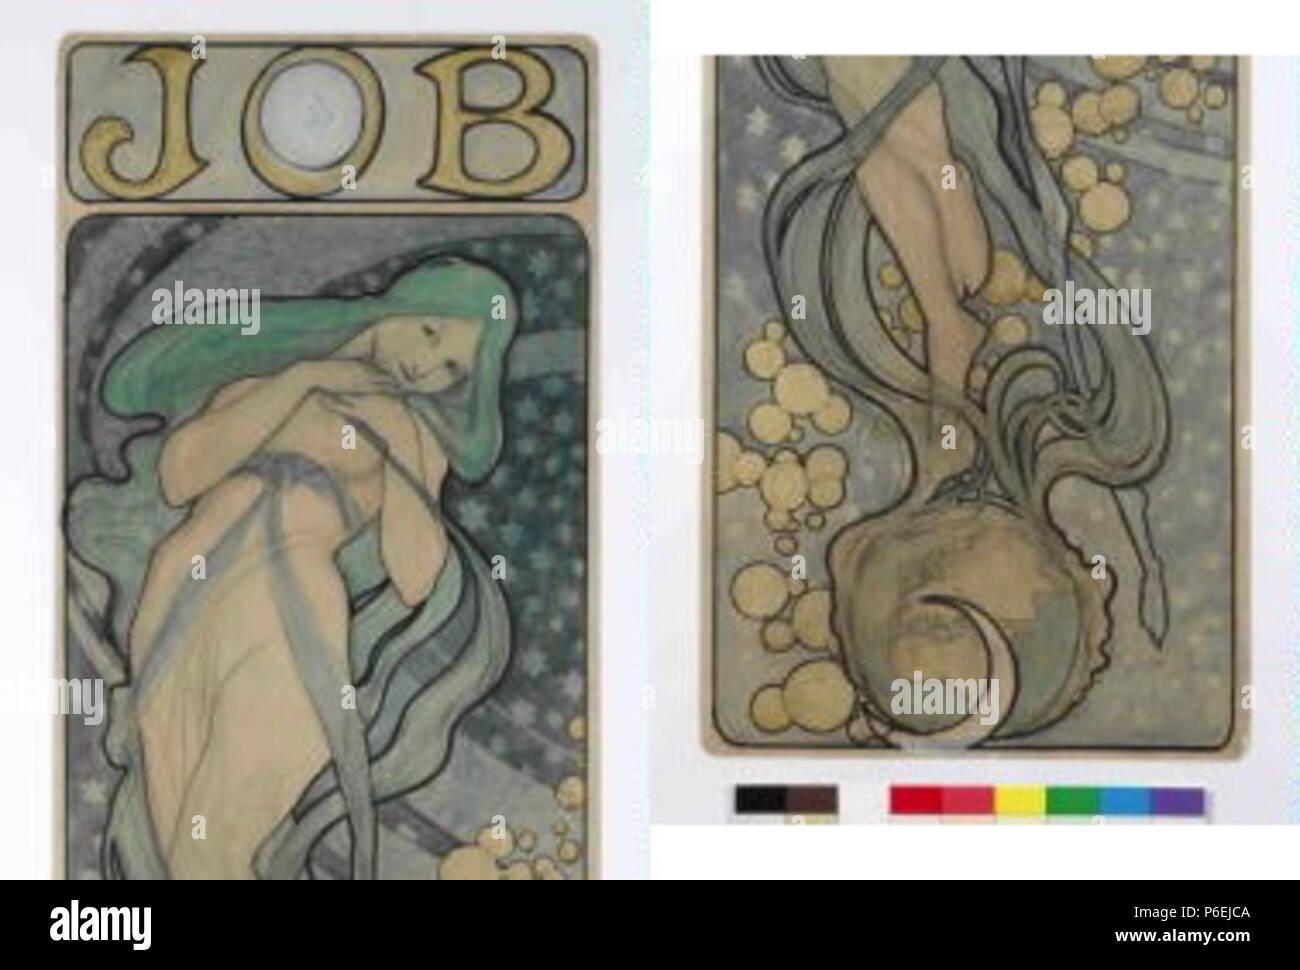 . Eština: Návrh na plakát JOB ca. 1897 6 Autor Alfons Mucha 24.7.1860-14.7.1939 - Navrh na Plakat JOB Stockfoto